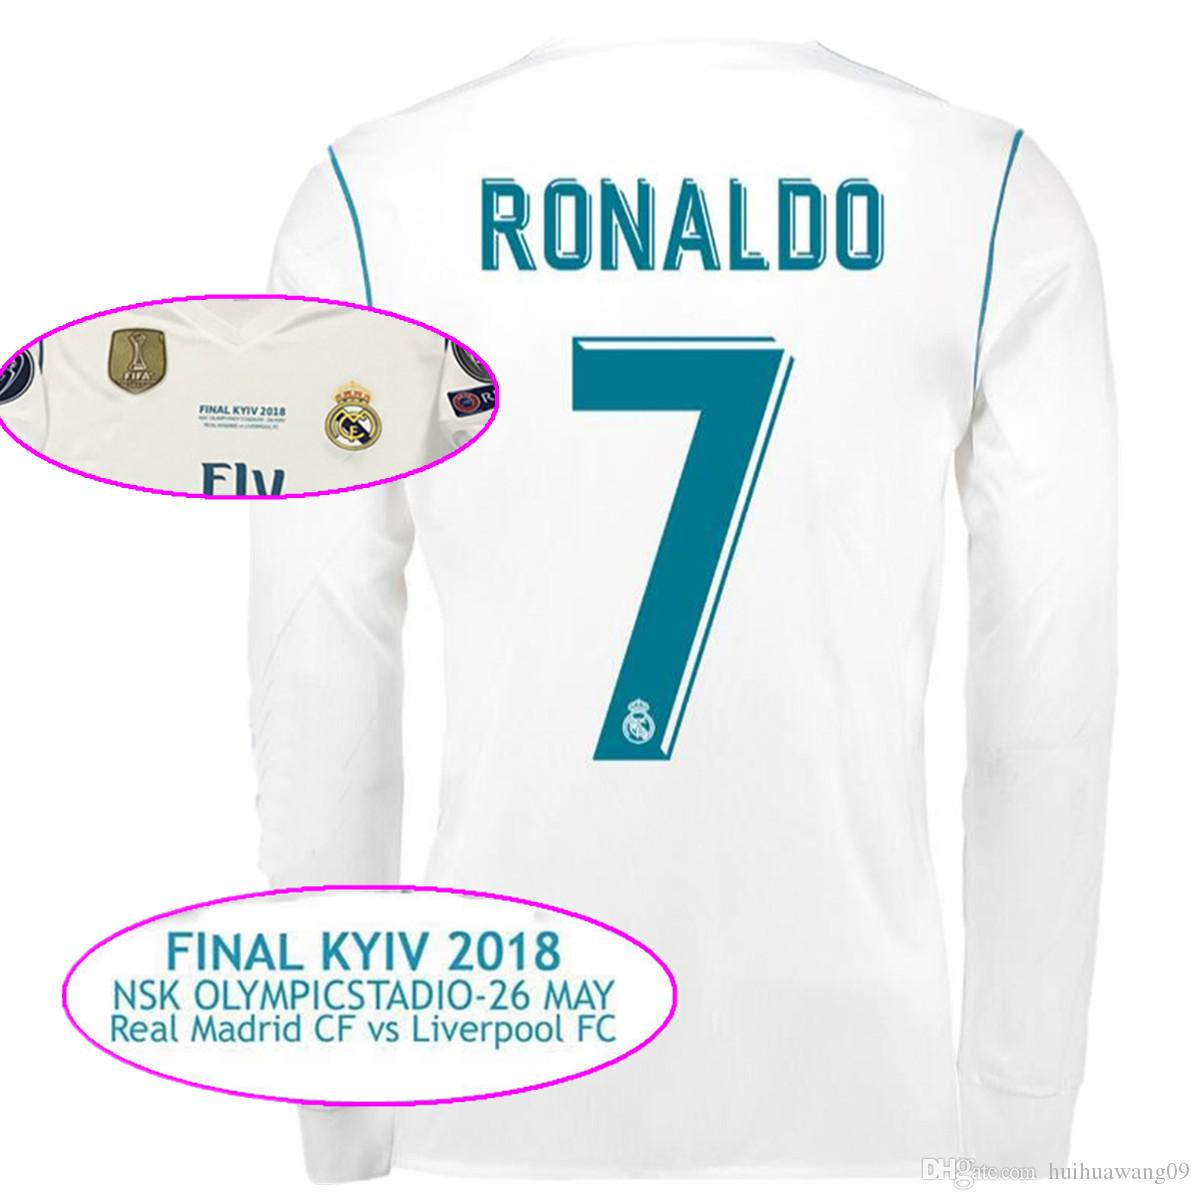 Long Sleeve 2018 Final Madrid Dynamo Final Kyiv 2018 May 26 Home White  Ronaldo Soccer Jerseys Asensio Bale Kroos Isco Football Shirts Morata  Camisetas De ...